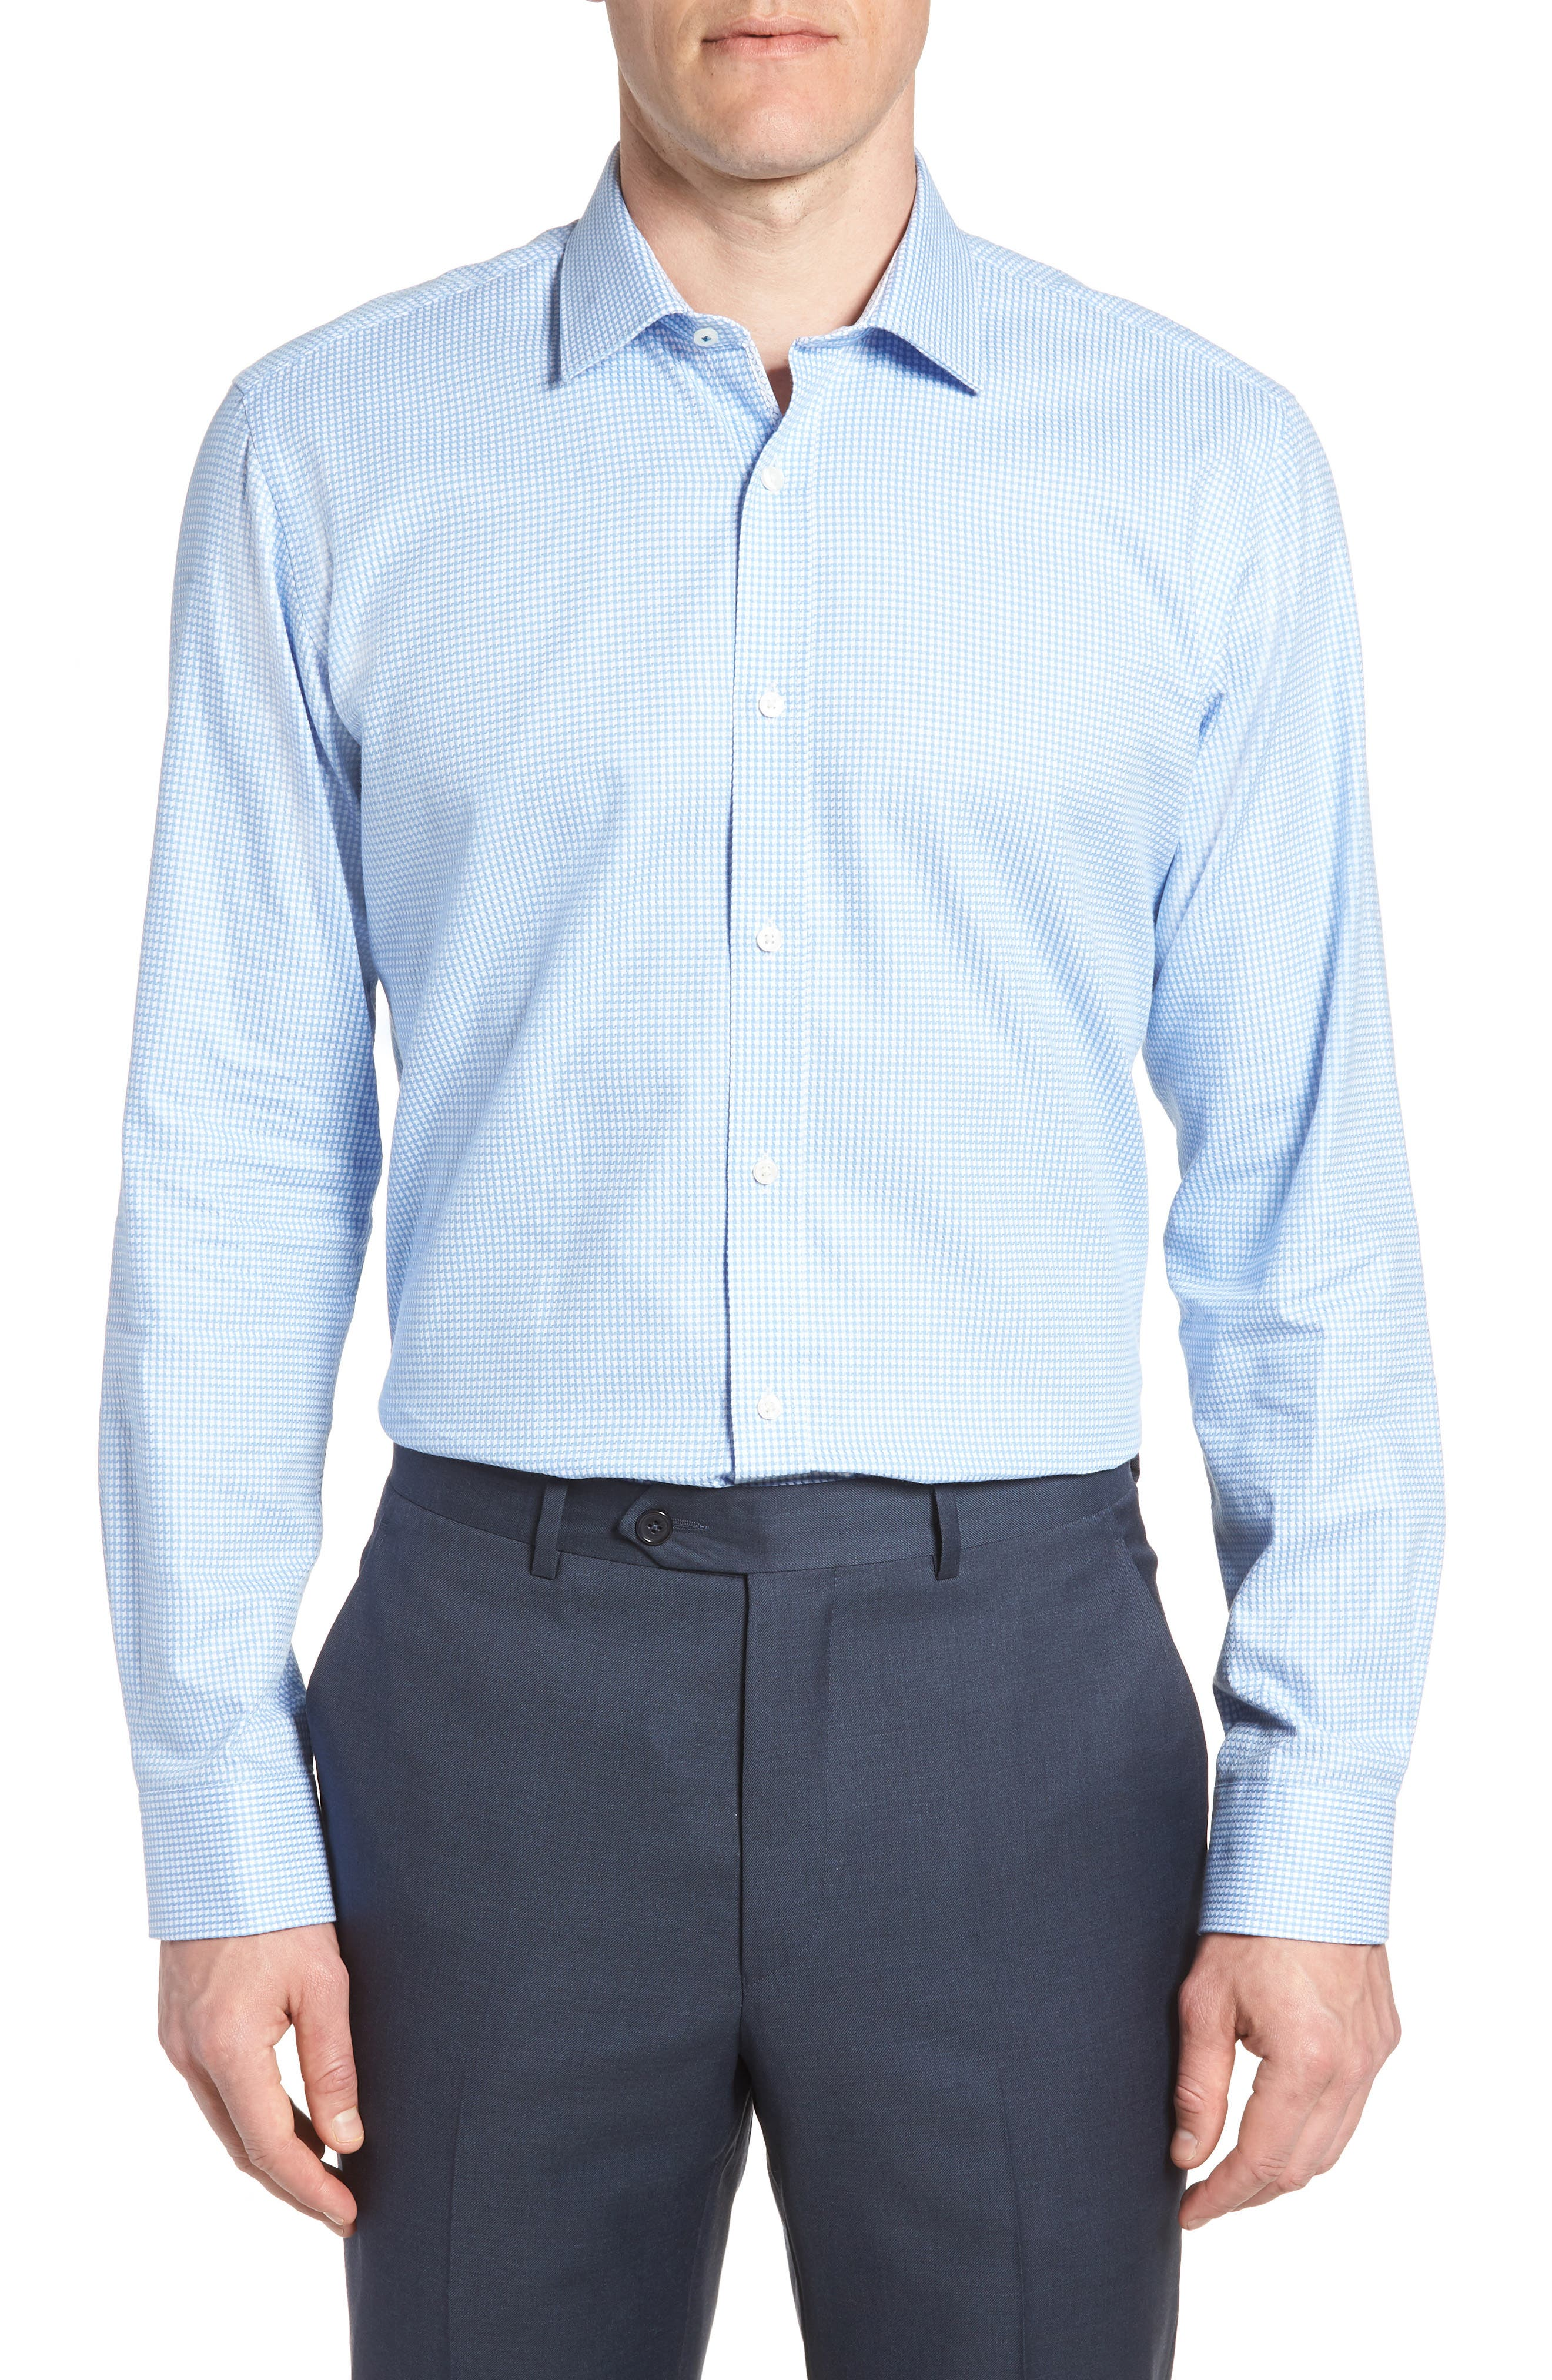 Jaiden Trim Fit Houndstooth Dress Shirt,                             Main thumbnail 1, color,                             450